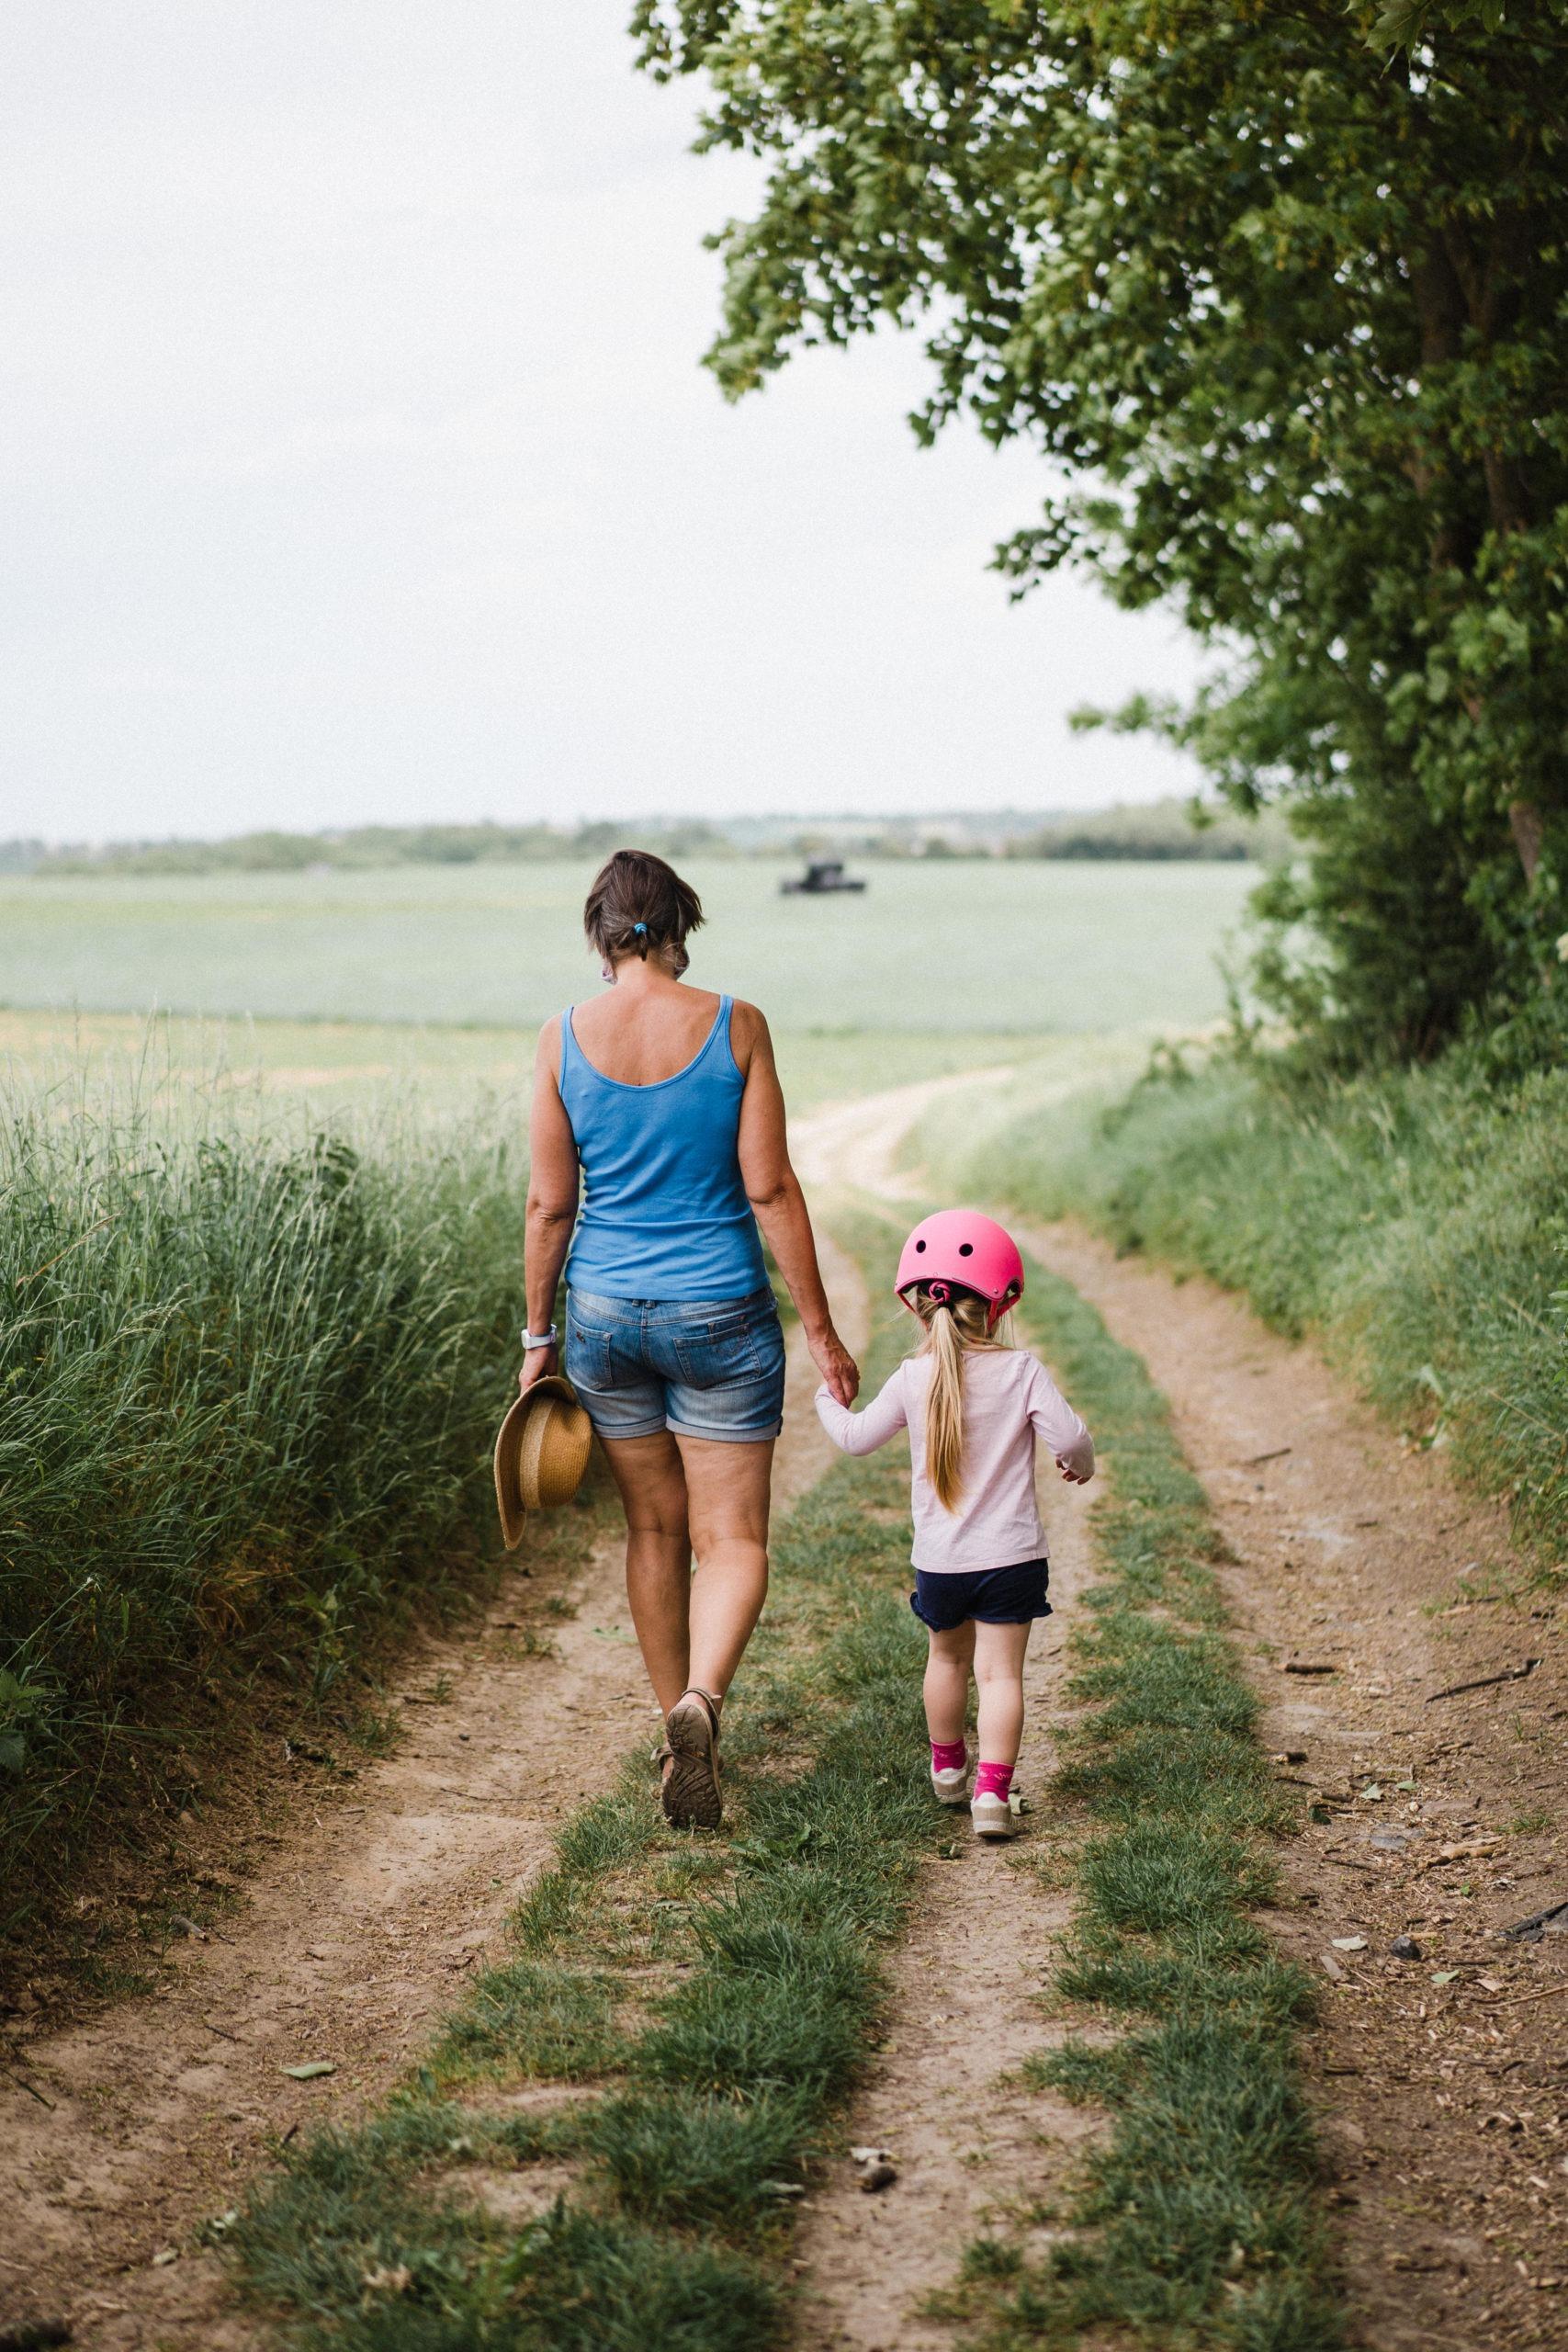 Promenade dans la campagne de Sombreffe 26